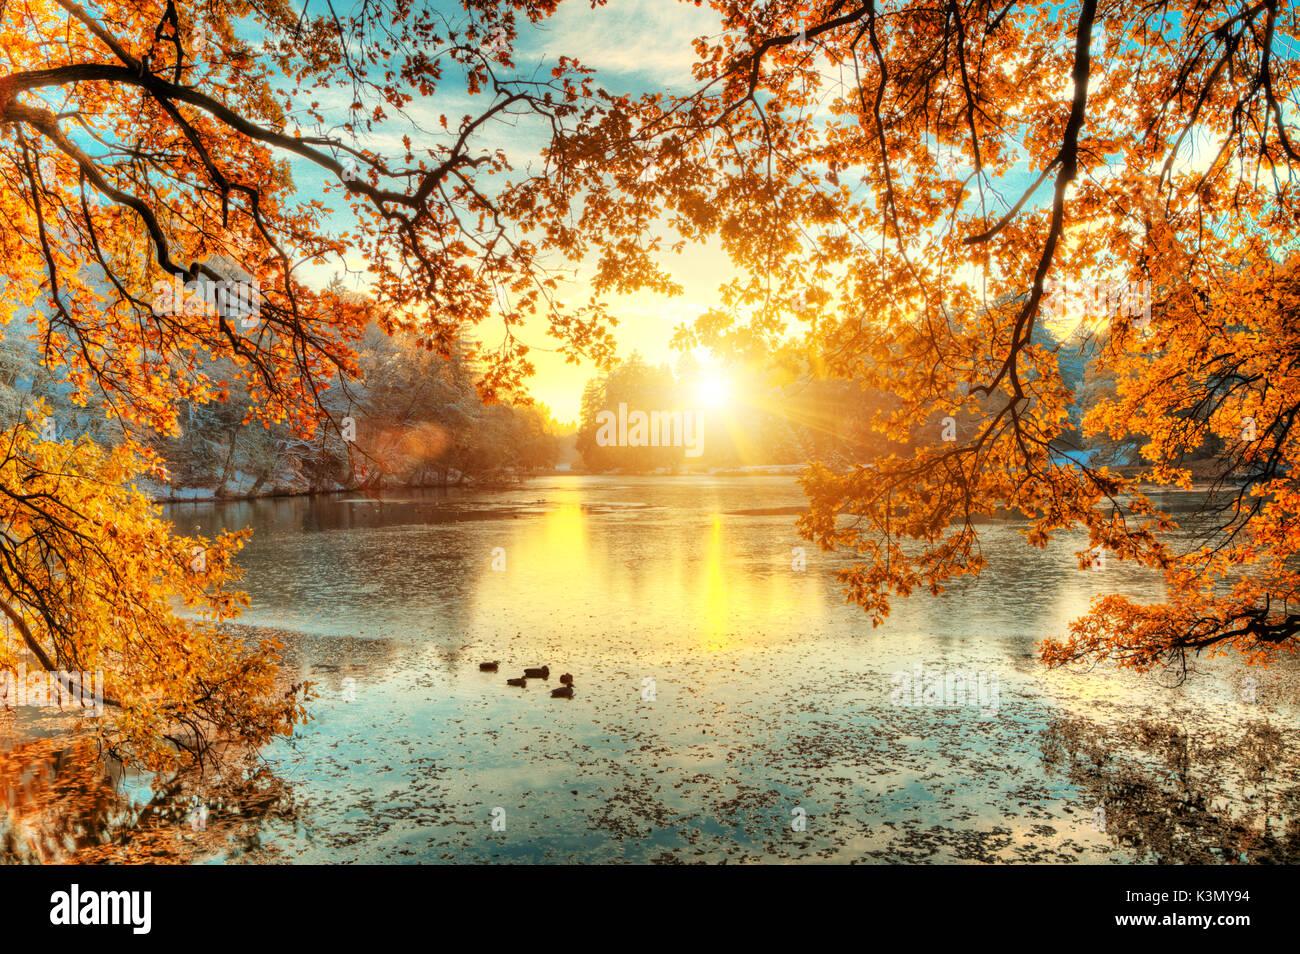 Beautiful Colorful Landscape Photography